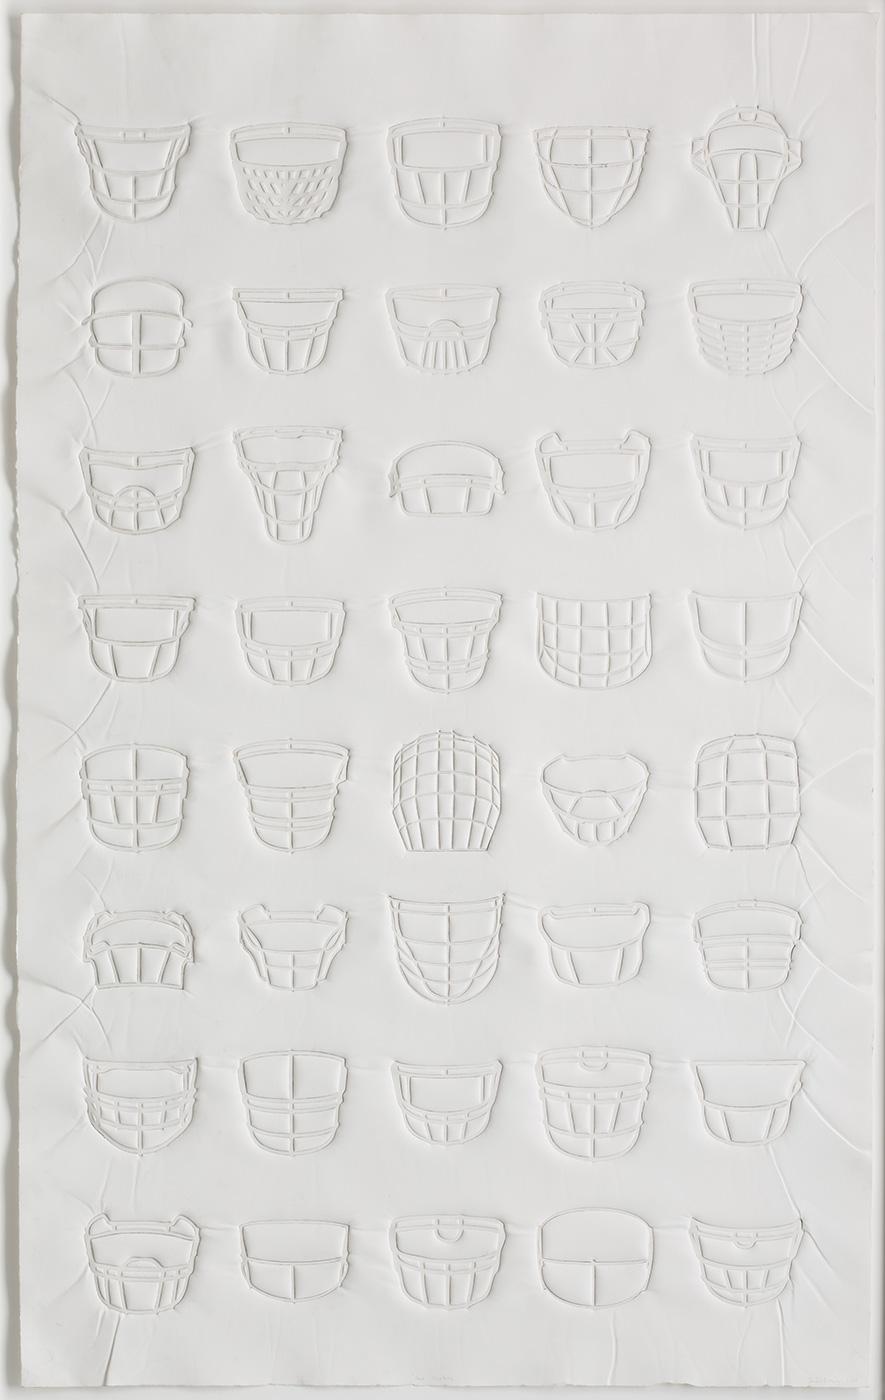 Daniel Greenberg - Face Masking